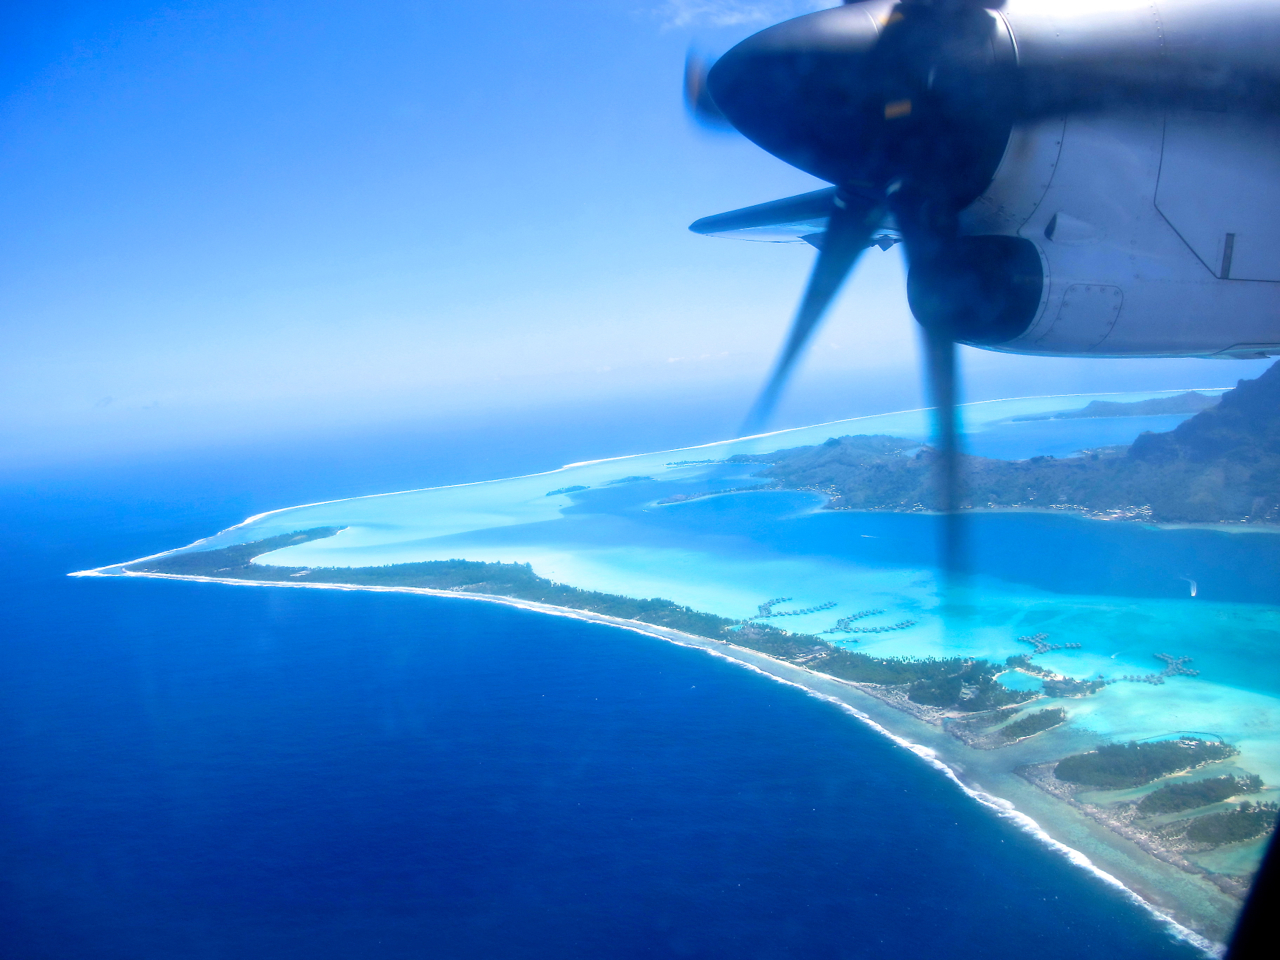 Bora Bora 2 aerial photograph